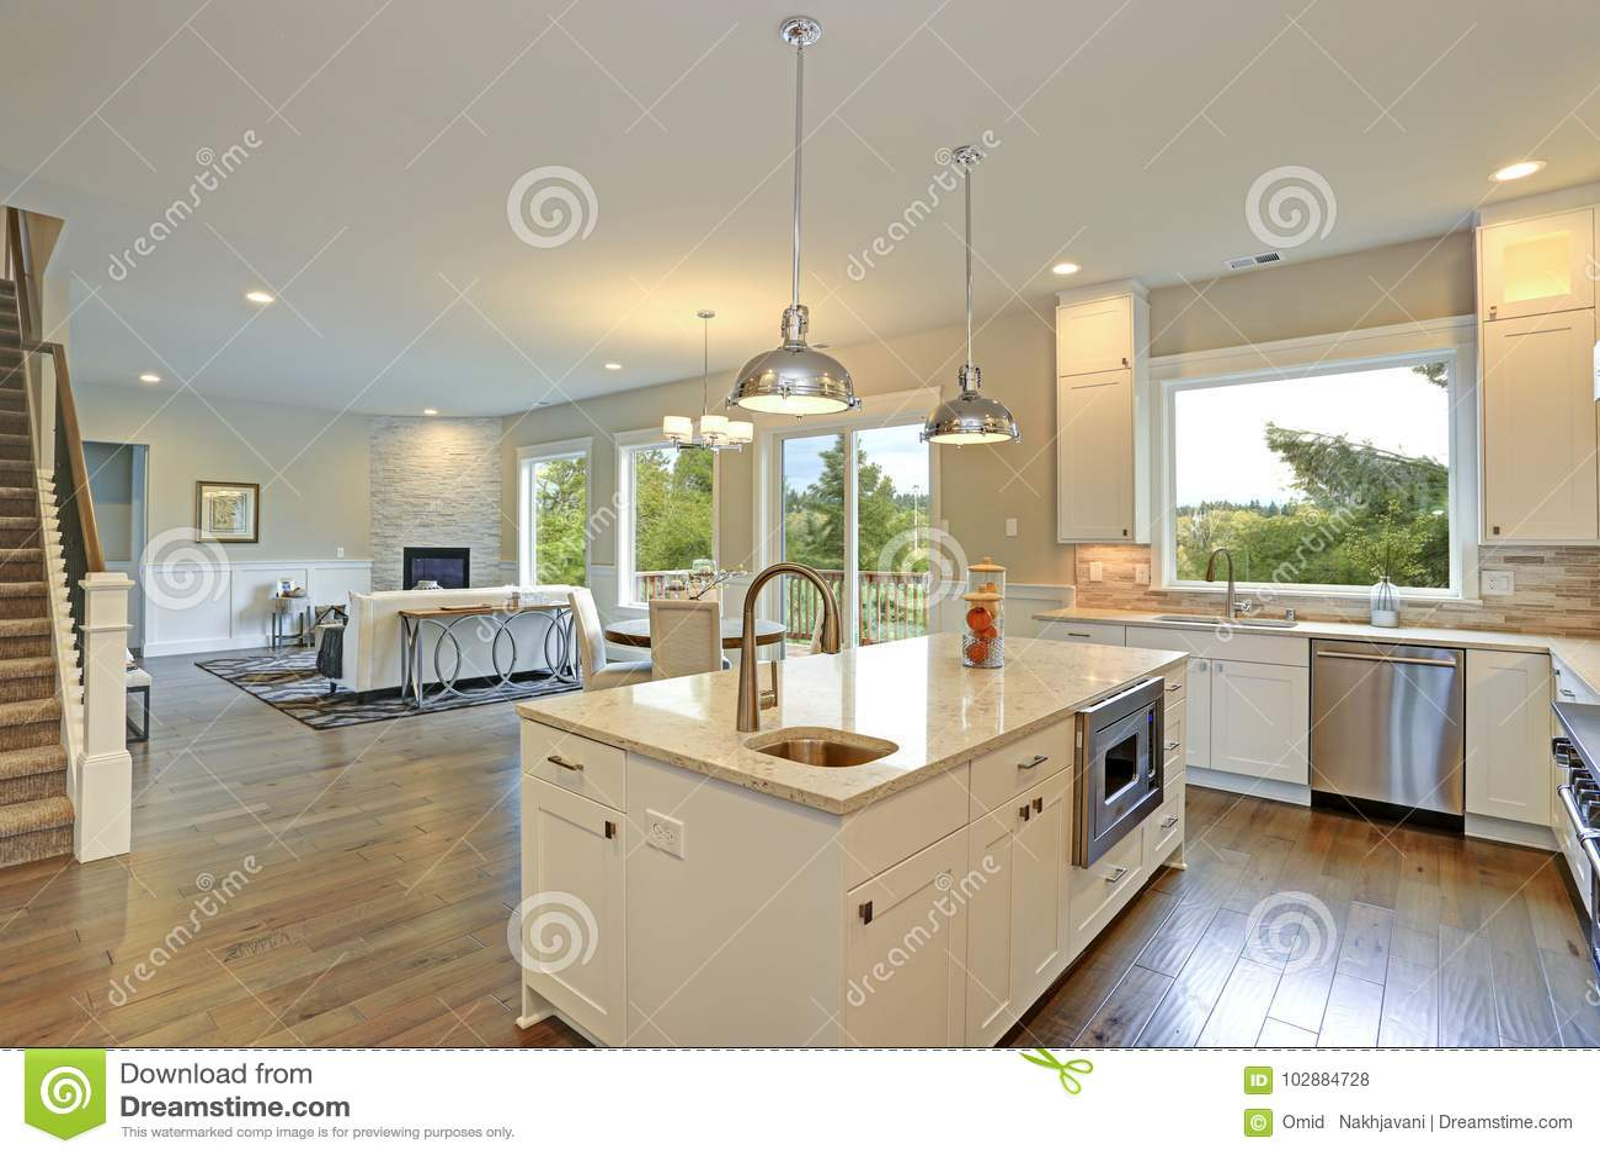 Luxury White Kitchen With Large Kitchen Island Stock Photo